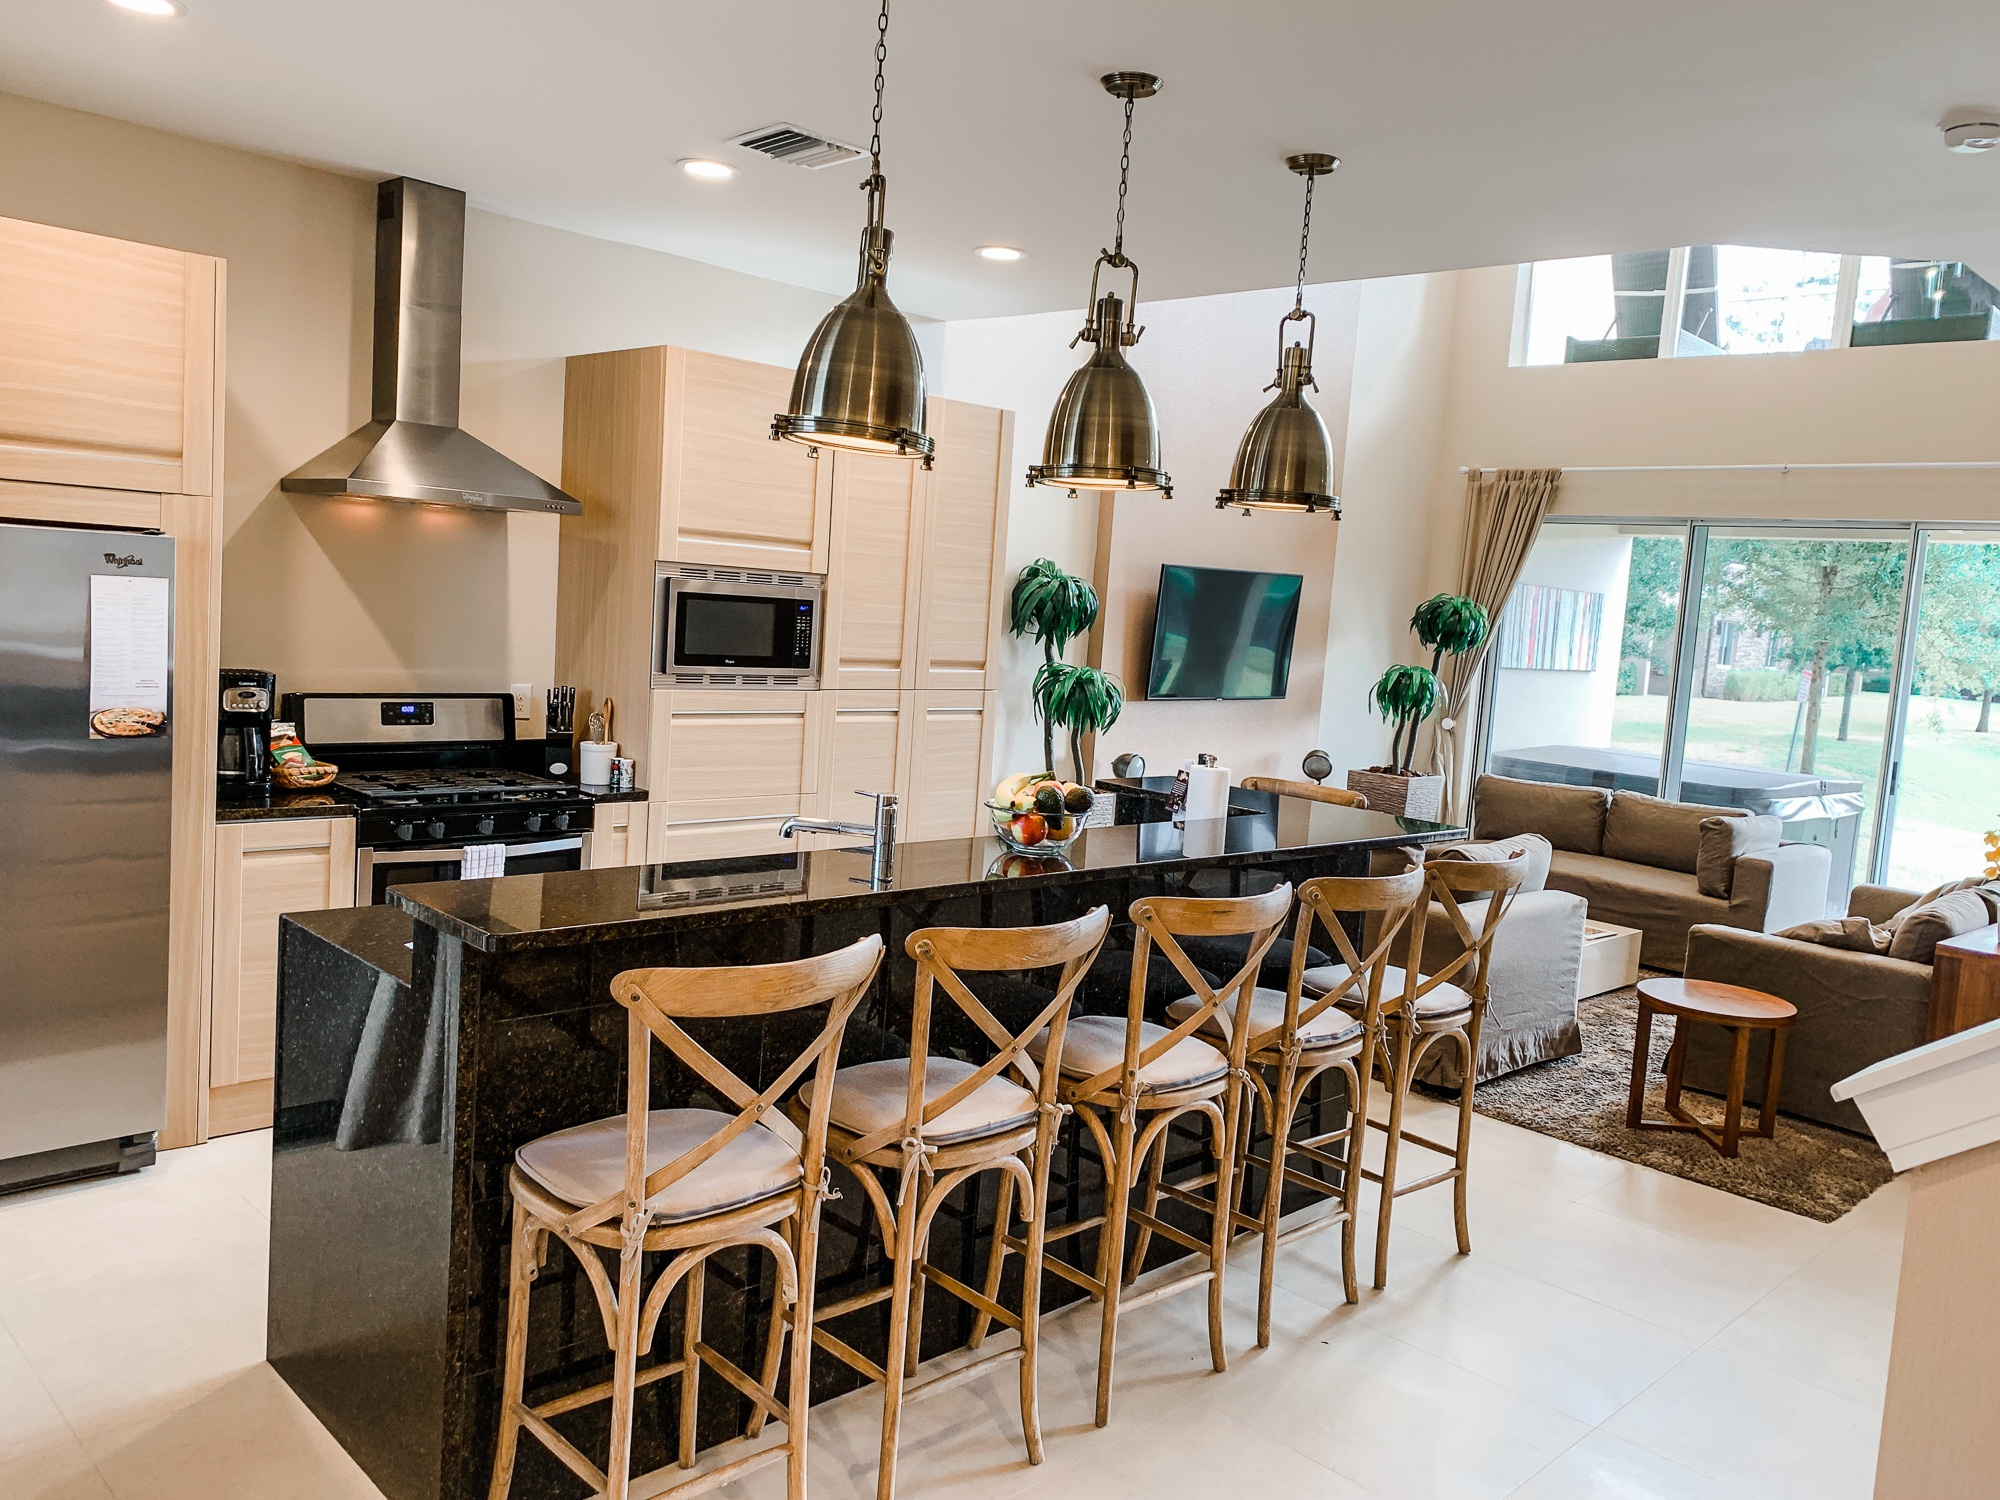 Kitchen at Magic Village Vacation Homes in Kissimmee, Florida near Walt Disney World